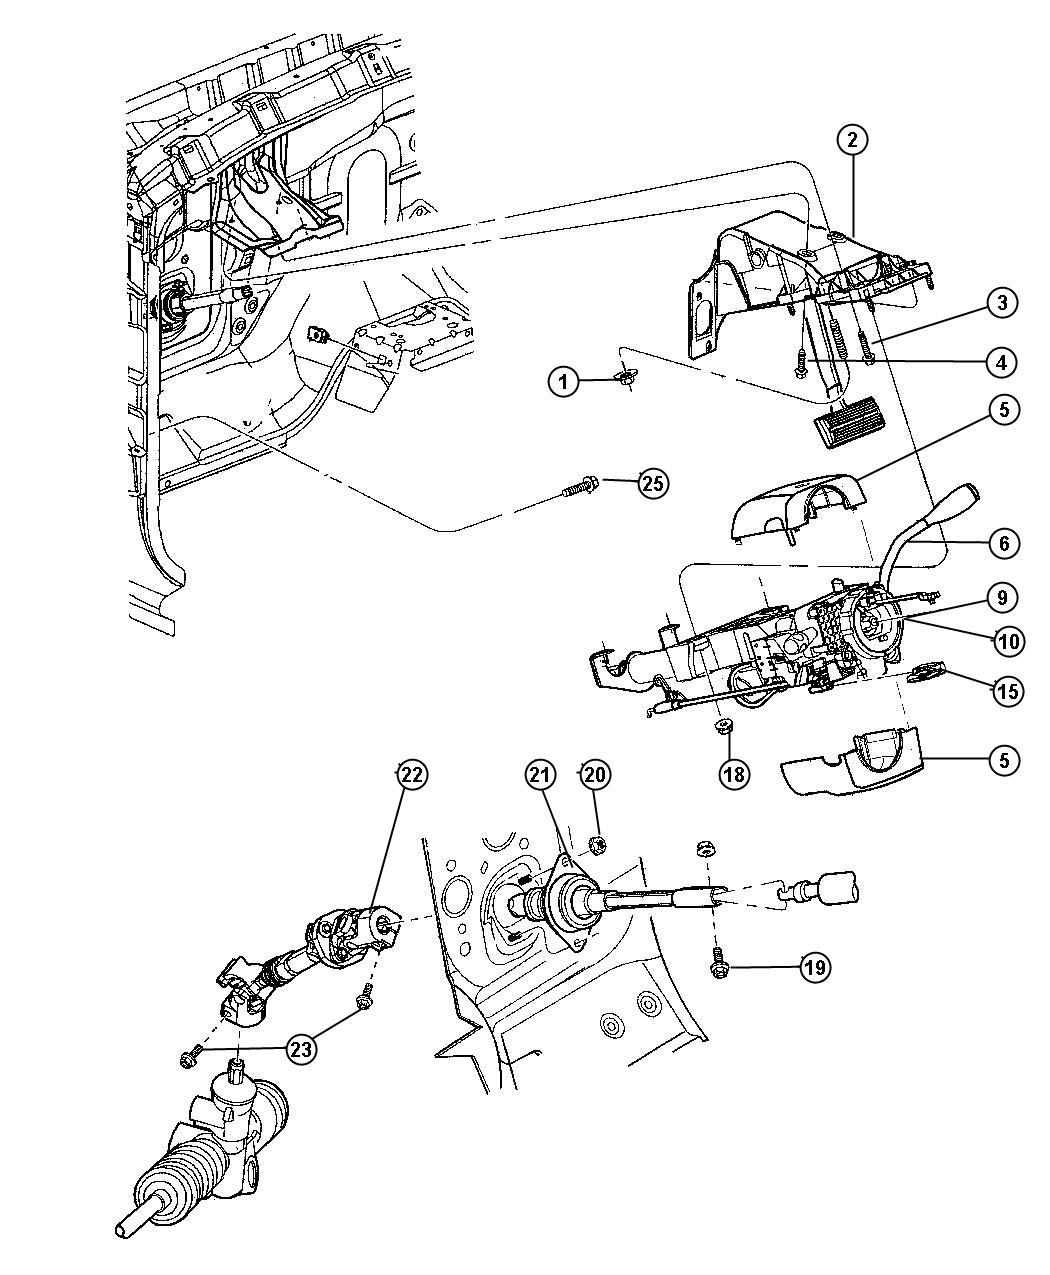 Dodge Ram Screw Hex Flange Head M10x1 50x46 30